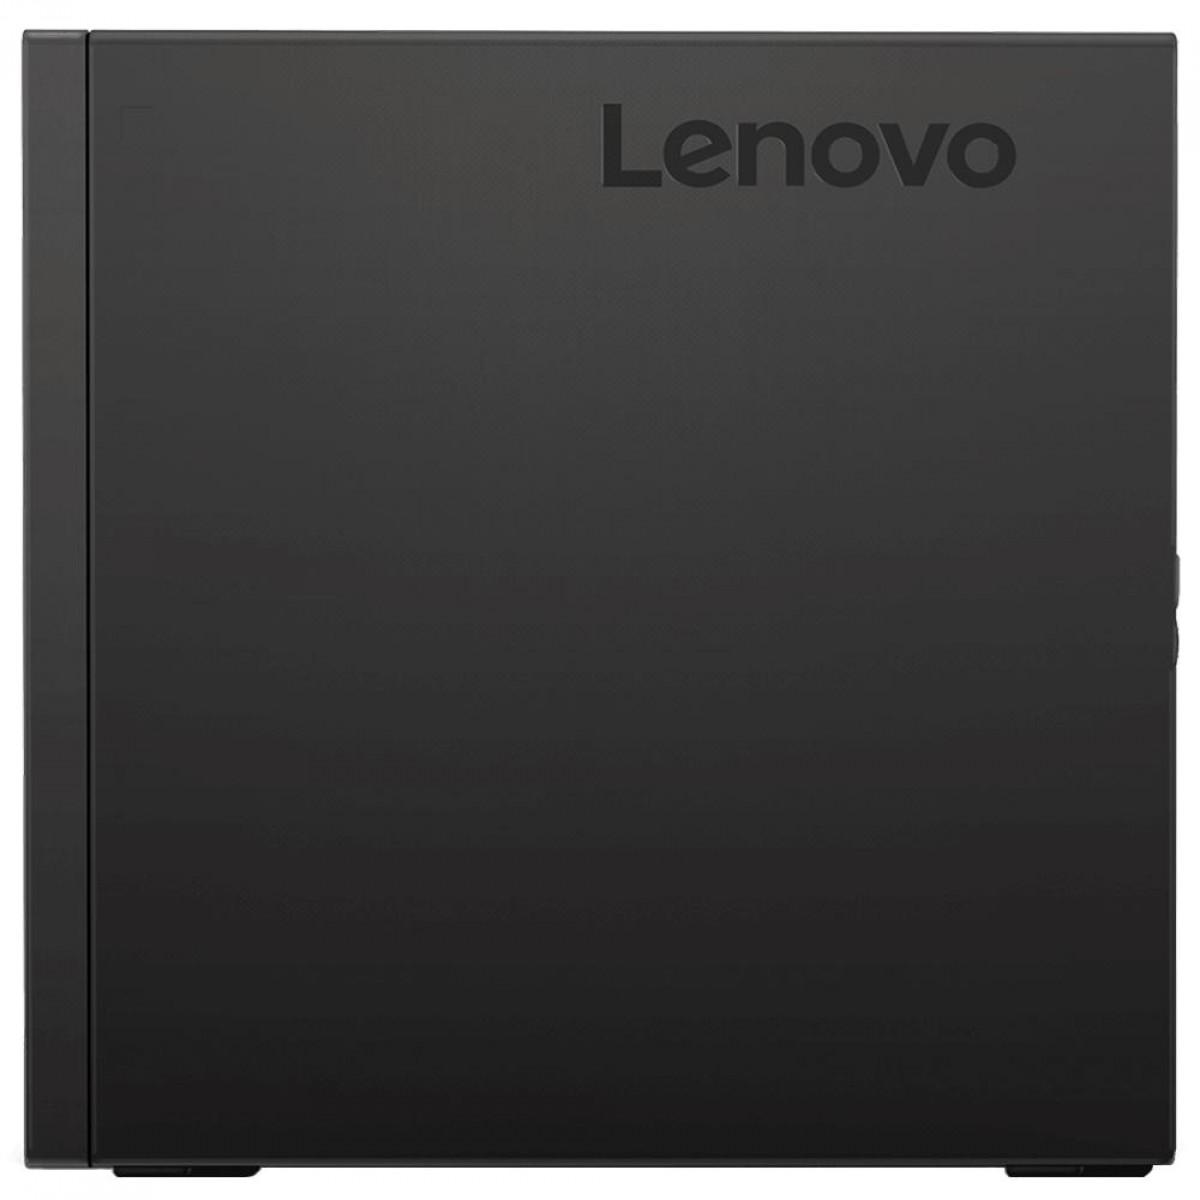 Computador Lenovo M720Q T-Moba  I3-8100T / 8GB / 1TB / Windows 10 Pro / Teclado Mouse